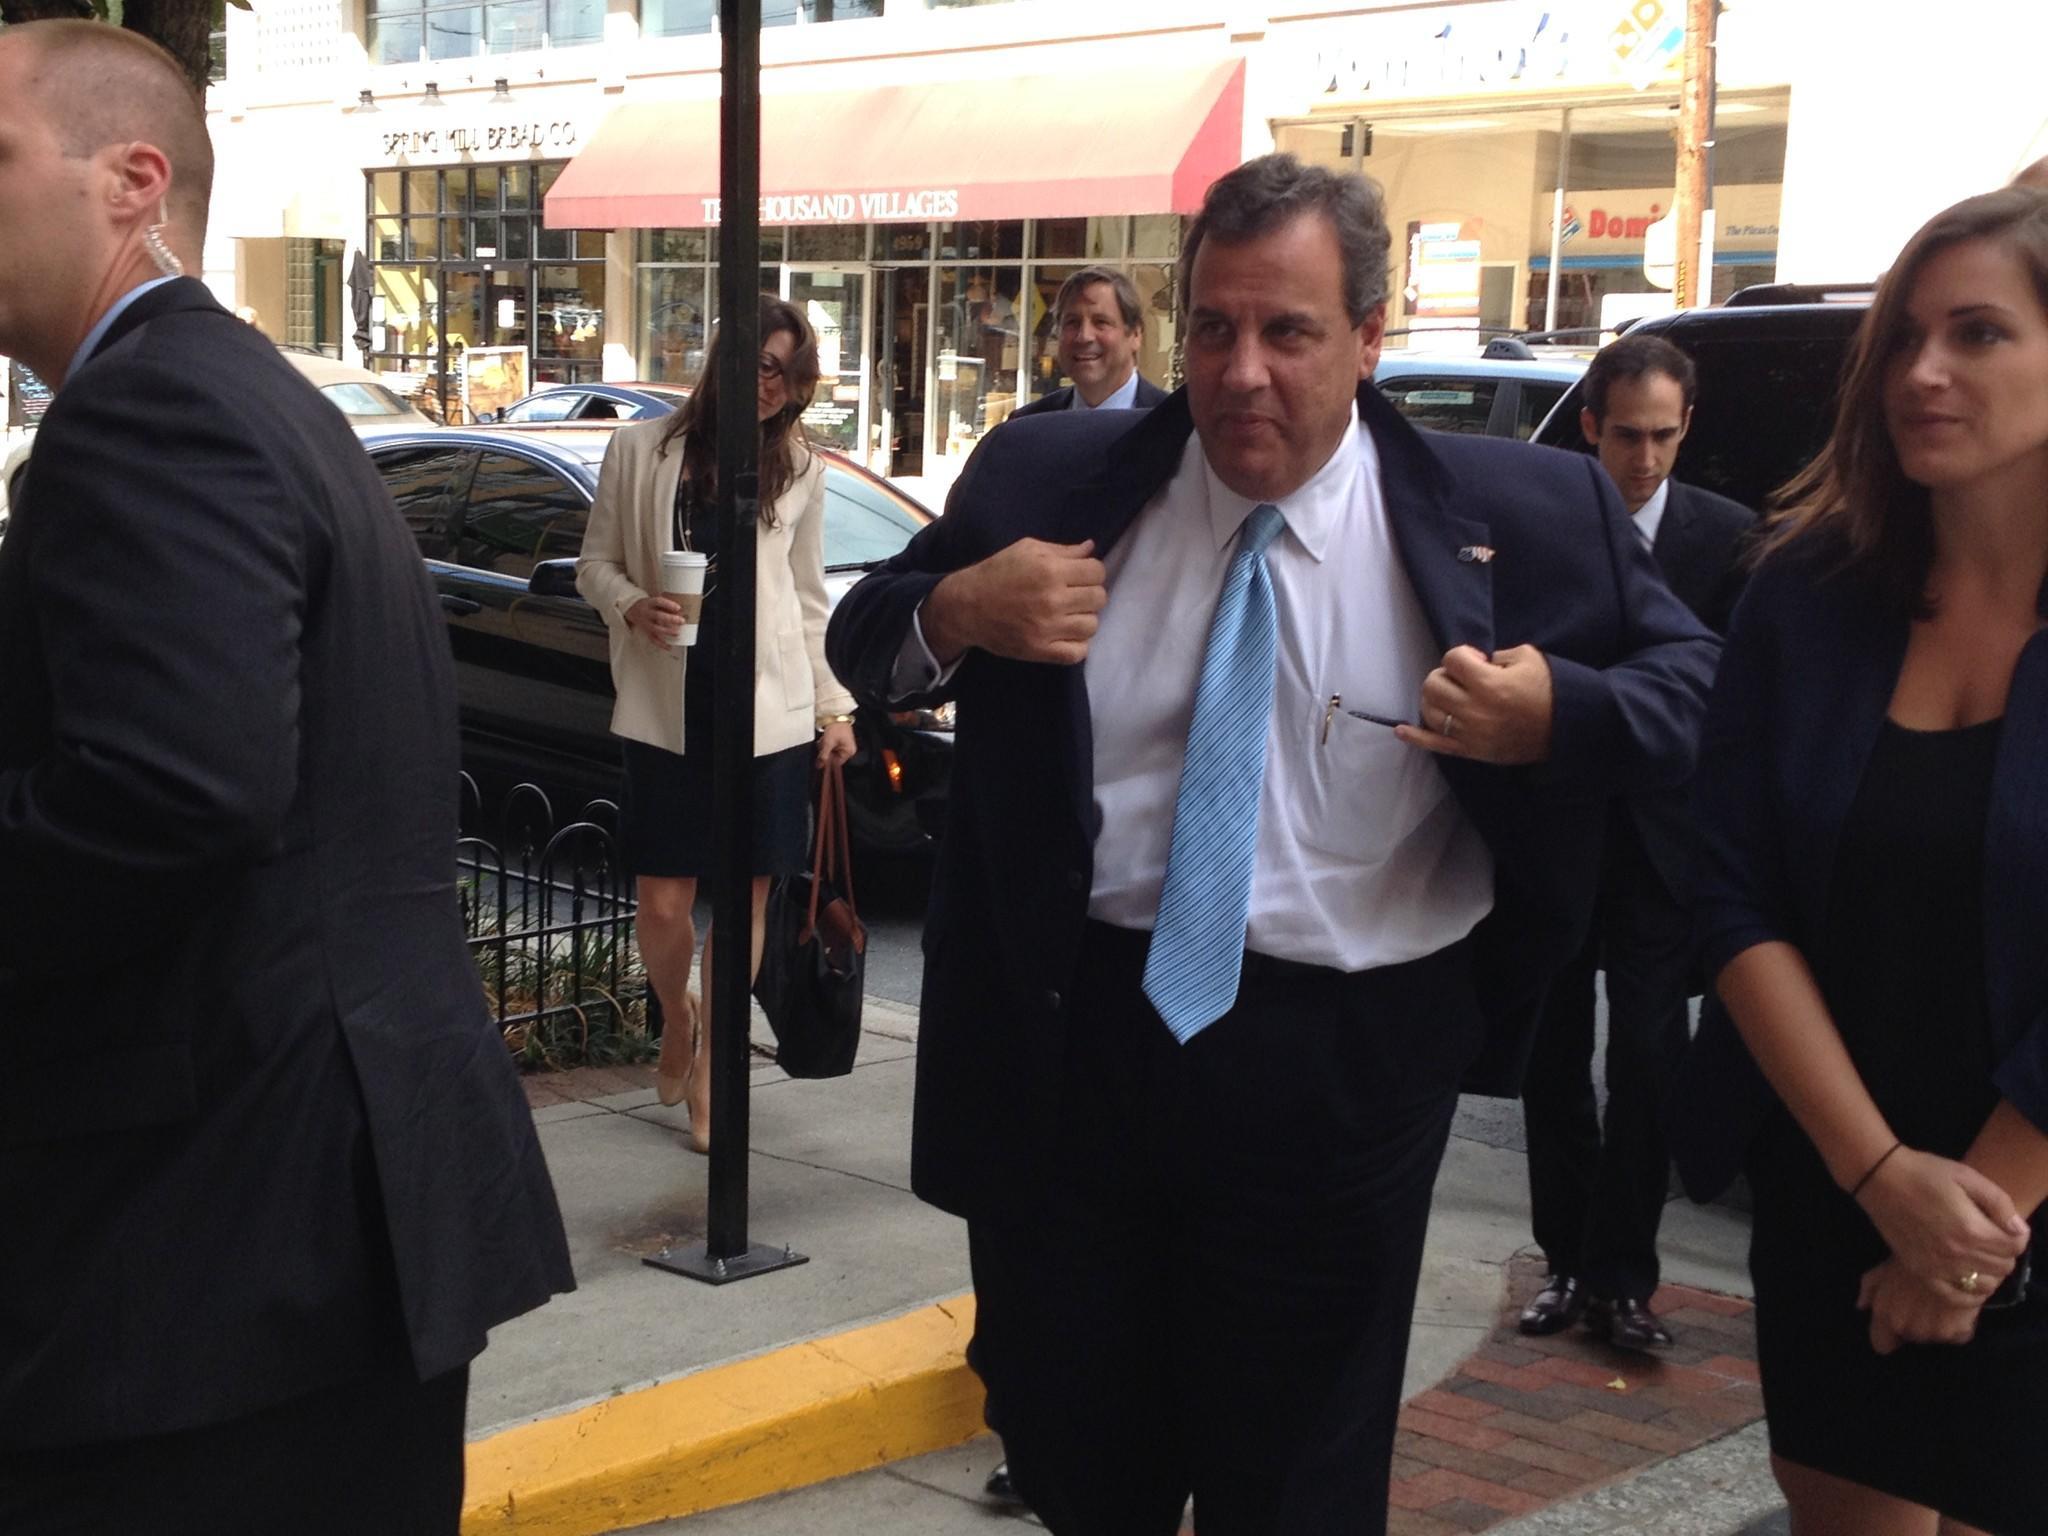 New Jersey Gov. Chris Christie arrives in Bethesda for a GOP fundraiser to benefit Republican gubernatorial candidate Larry Hogan.